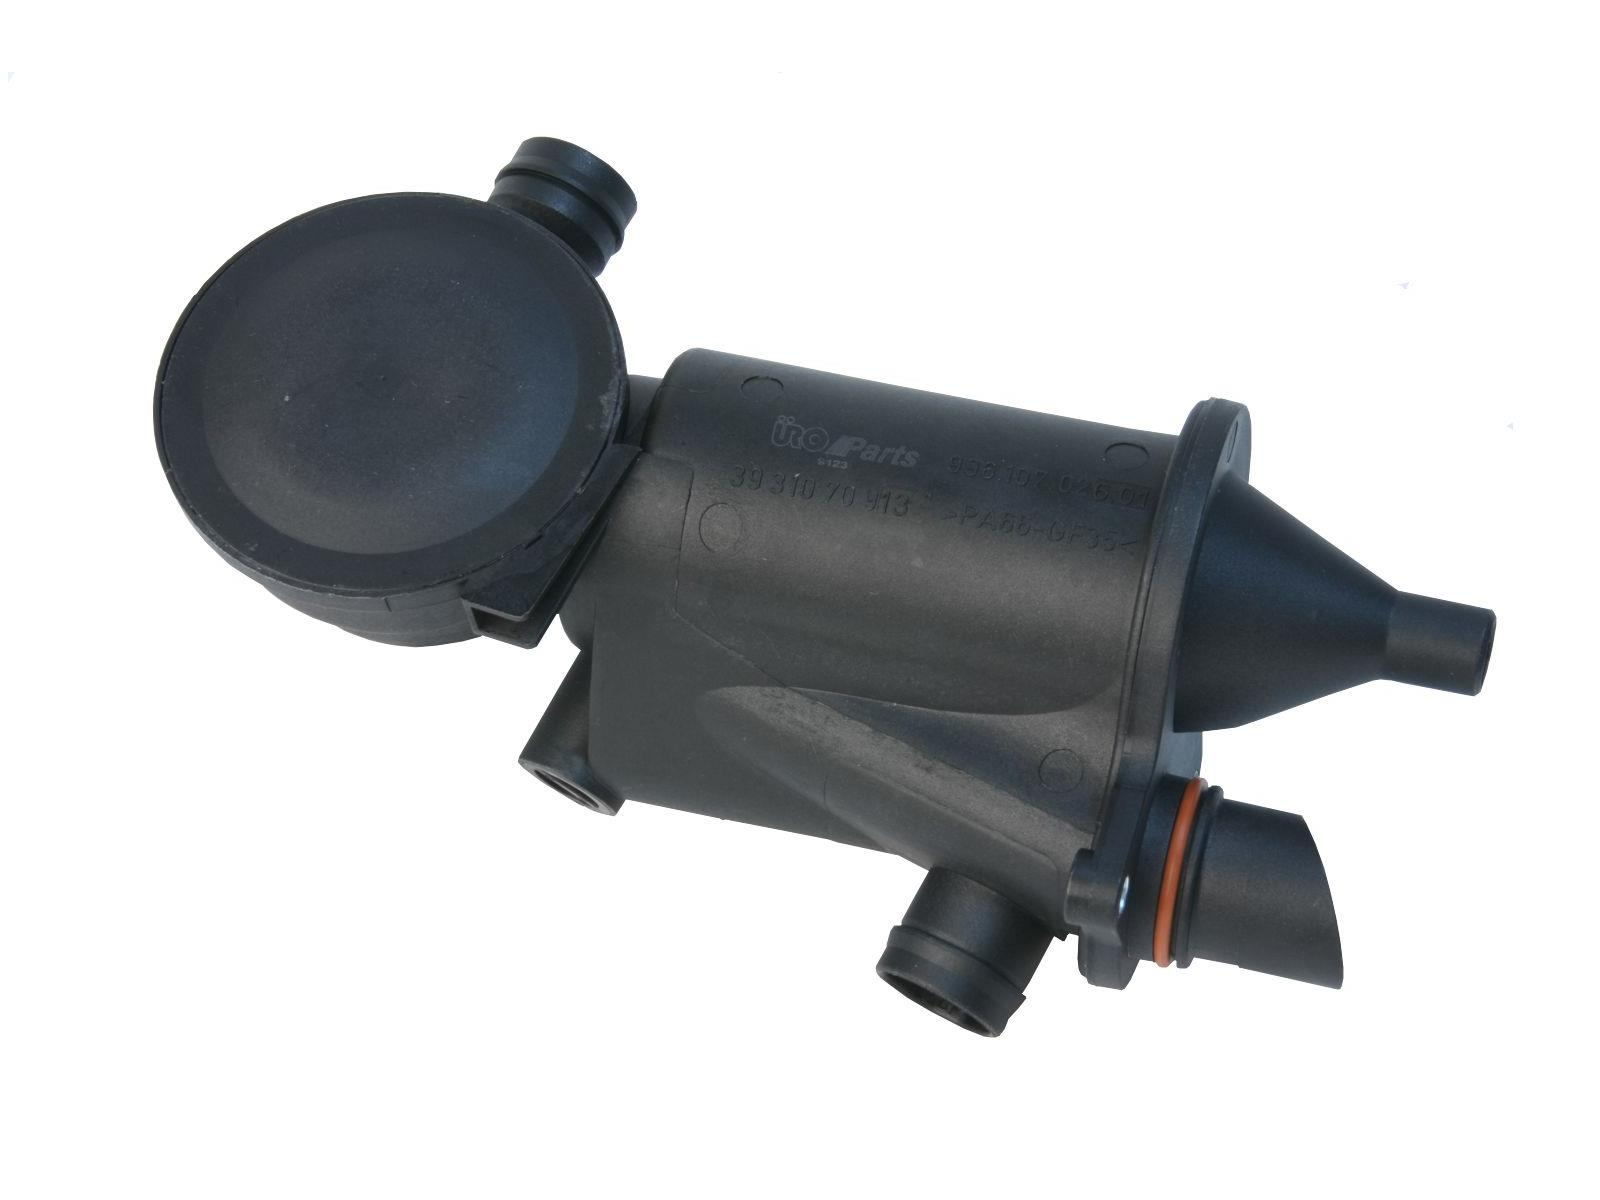 Ölabscheider für Porsche Boxster / Cayman Kurbelgehäuse Entlüftung